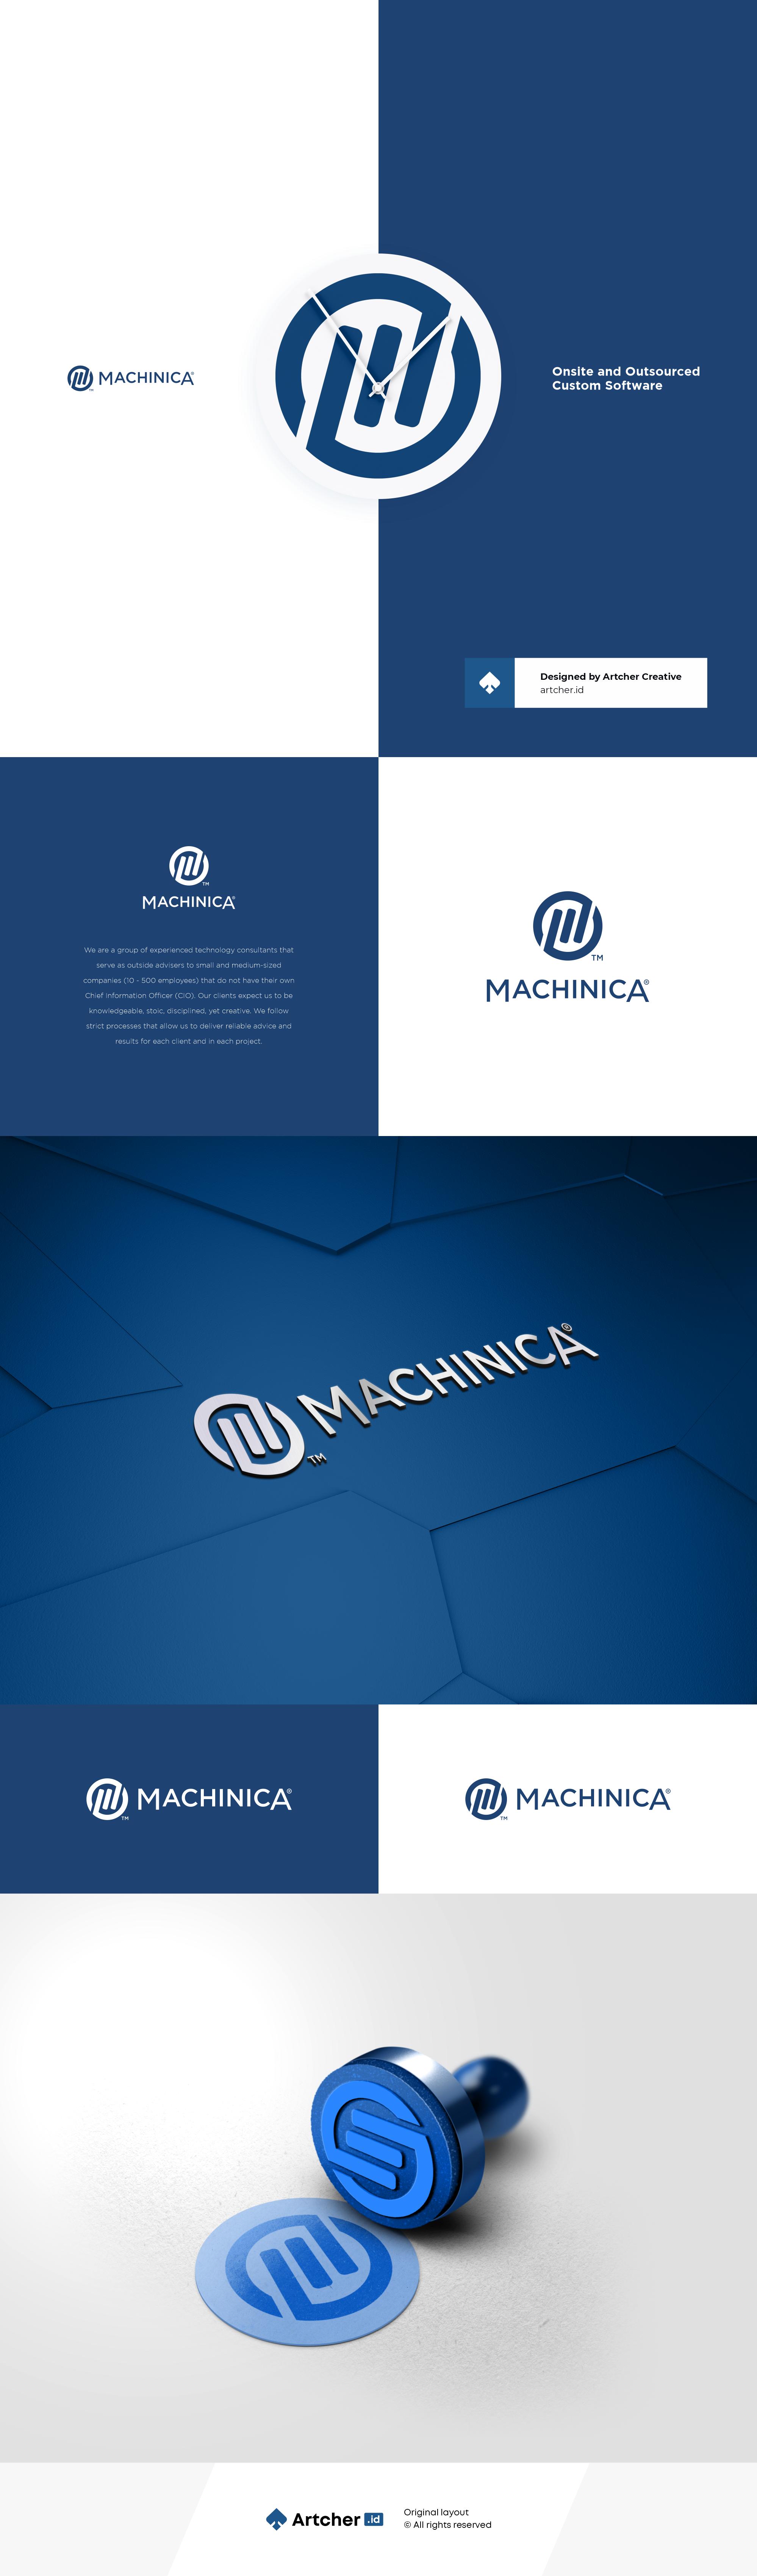 Machinica Logotype Update